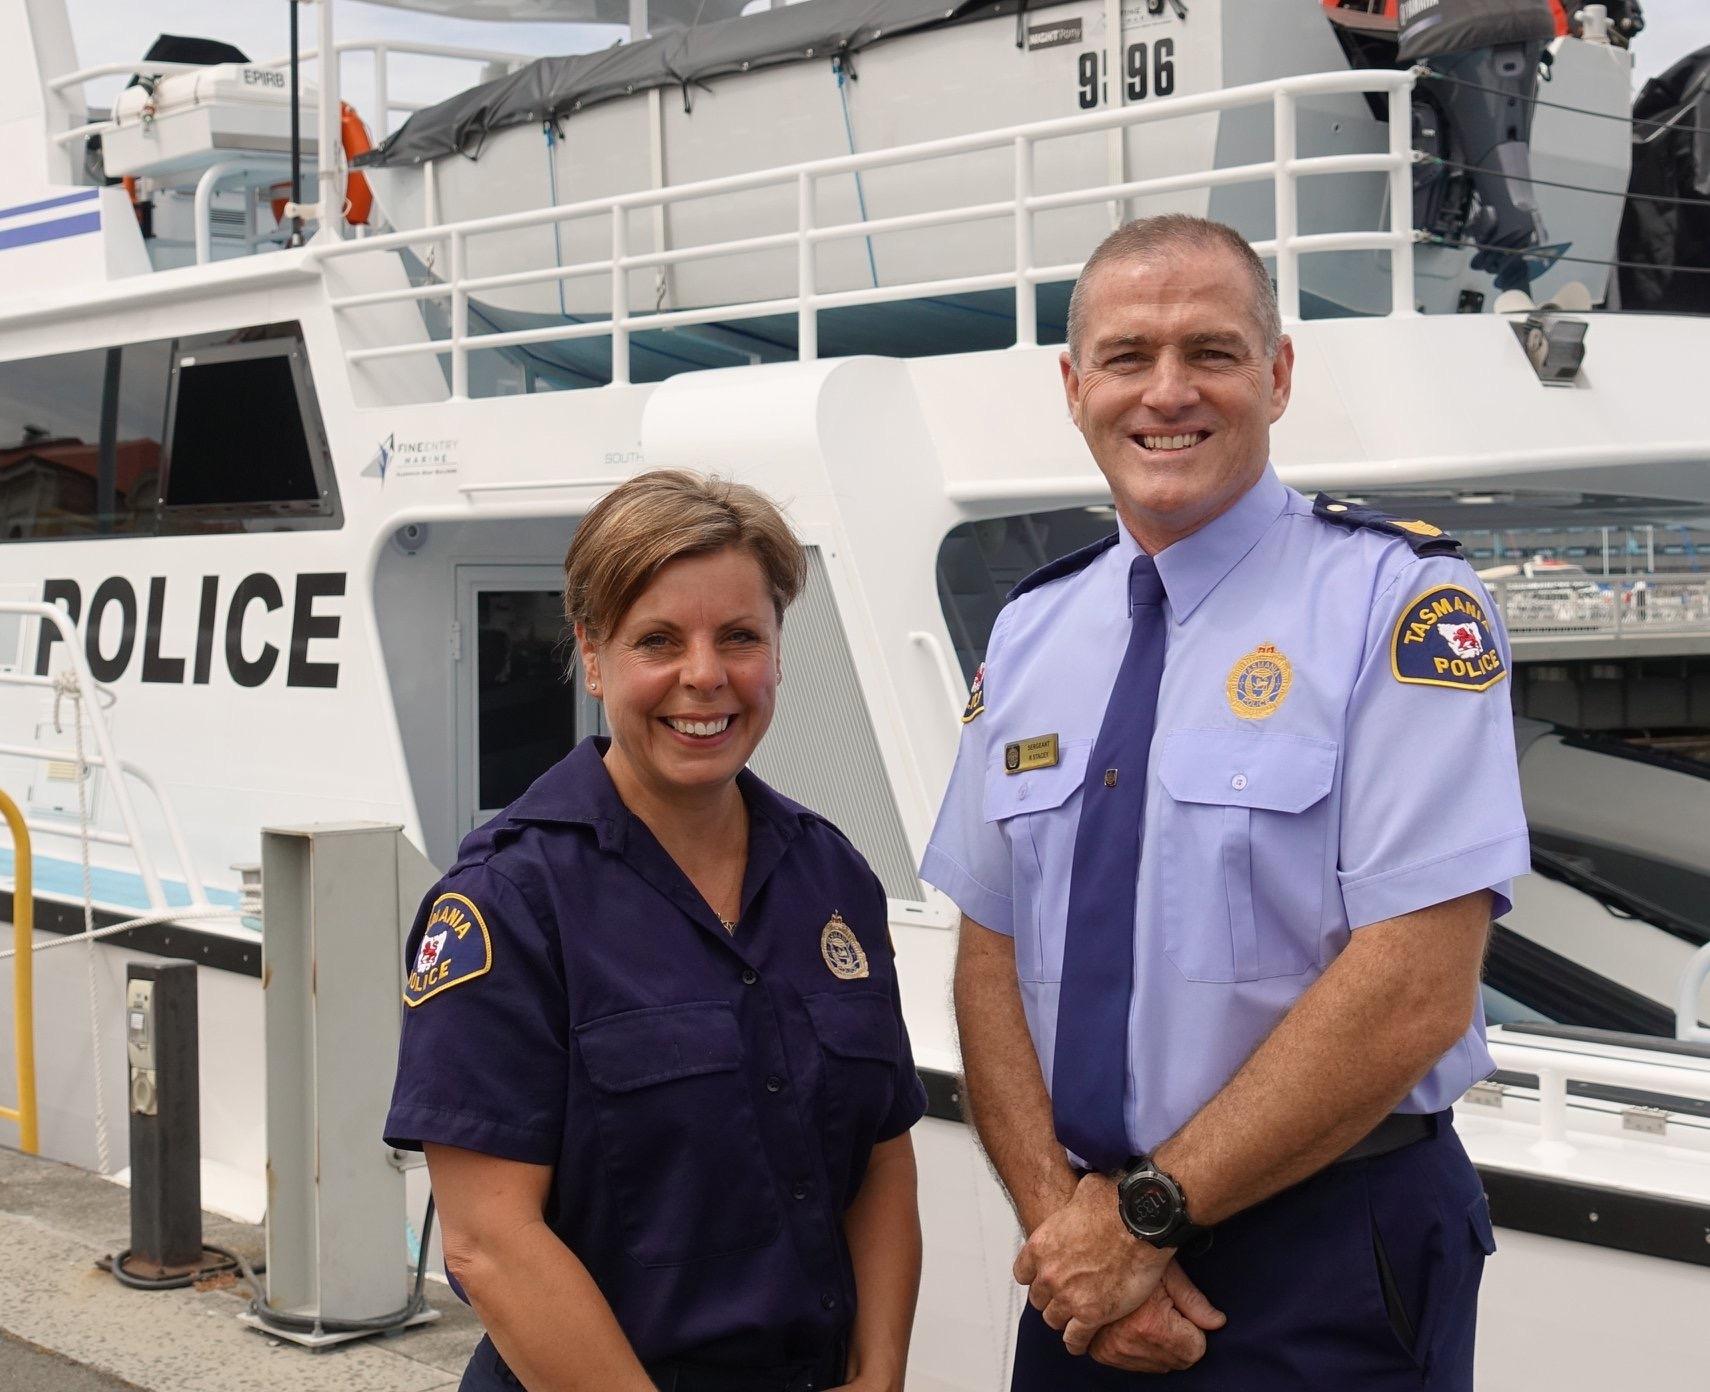 Congratulations Sergeant Stacey